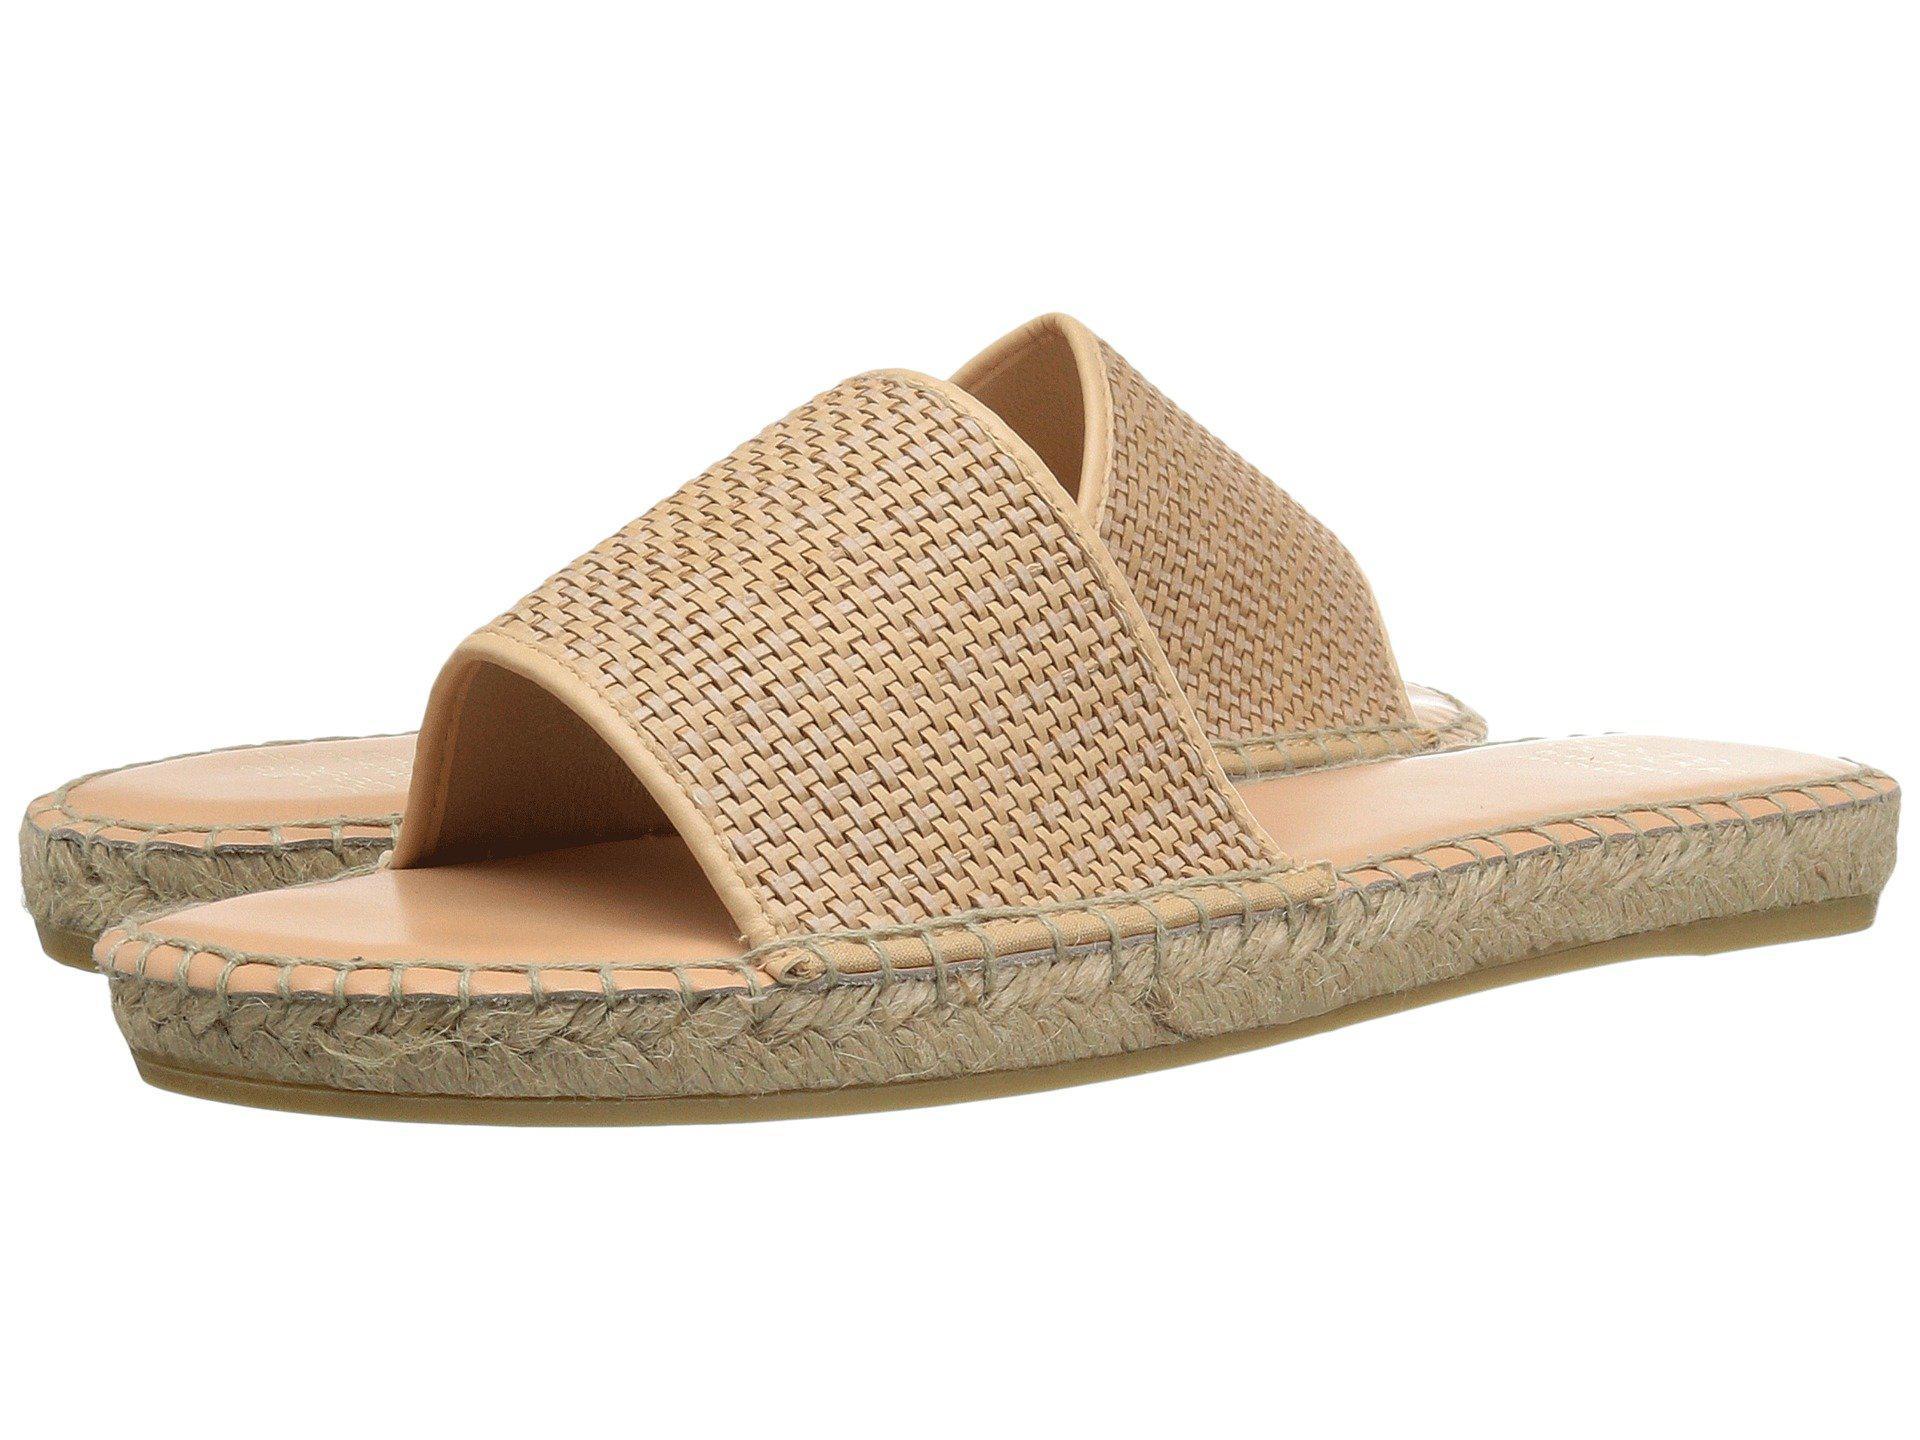 Andre Assous Nolana Slide Sandal(Women's) -Beige Woven Enjoy For Sale Cheap Looking For Visa Payment Cheap Online Sunshine bZ9g5b8dG2